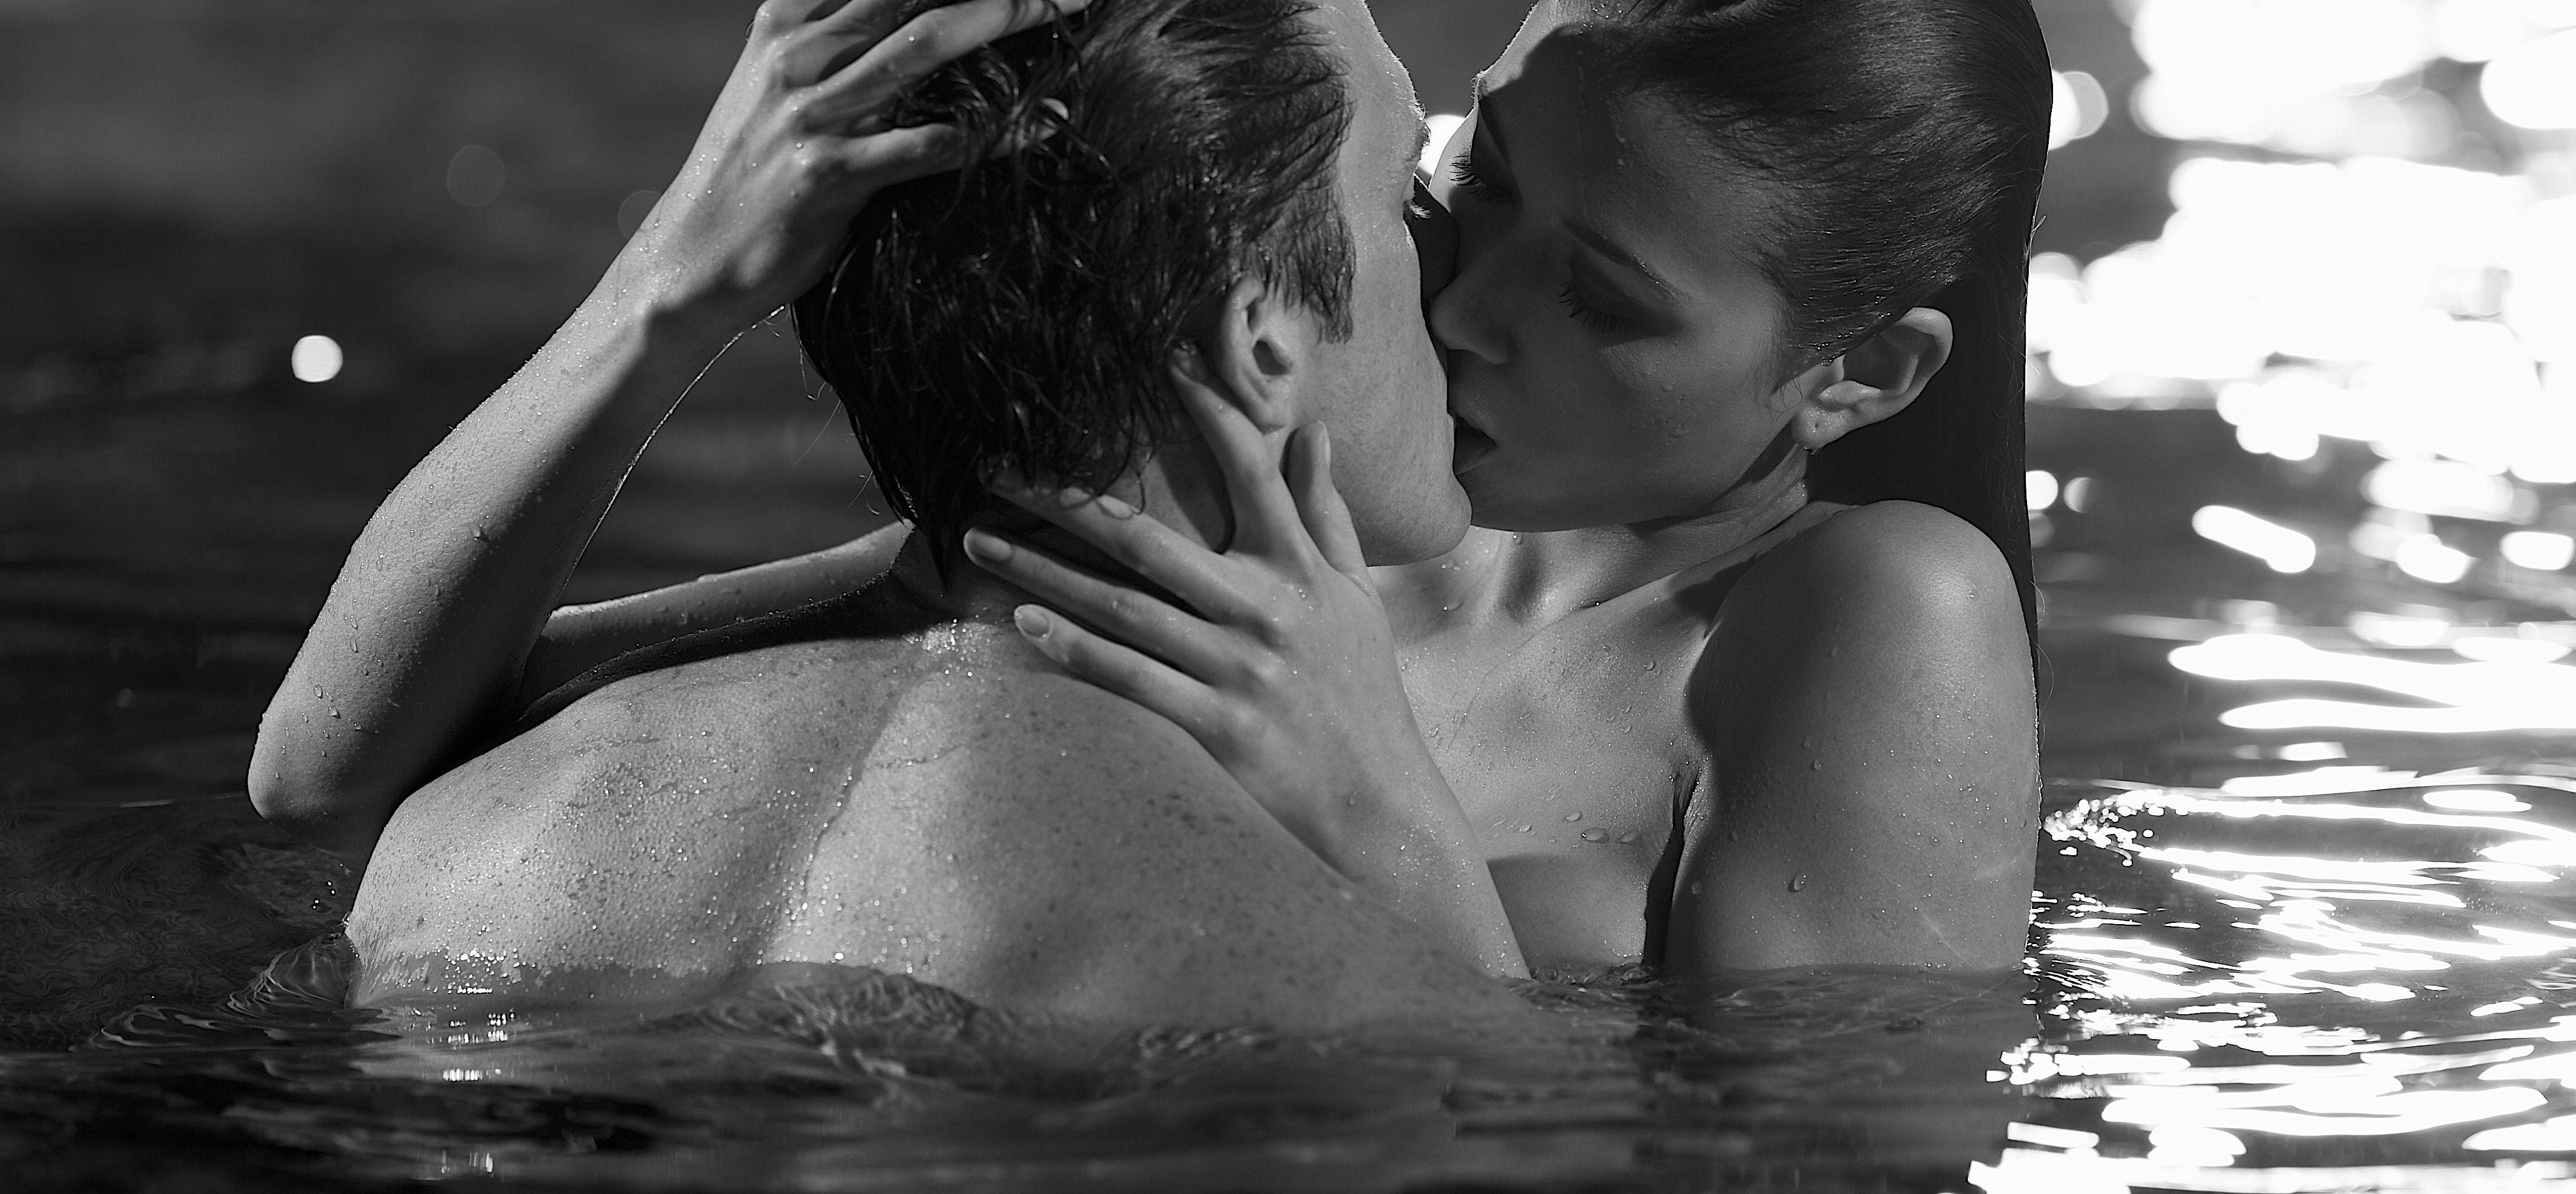 Pool Sex Story